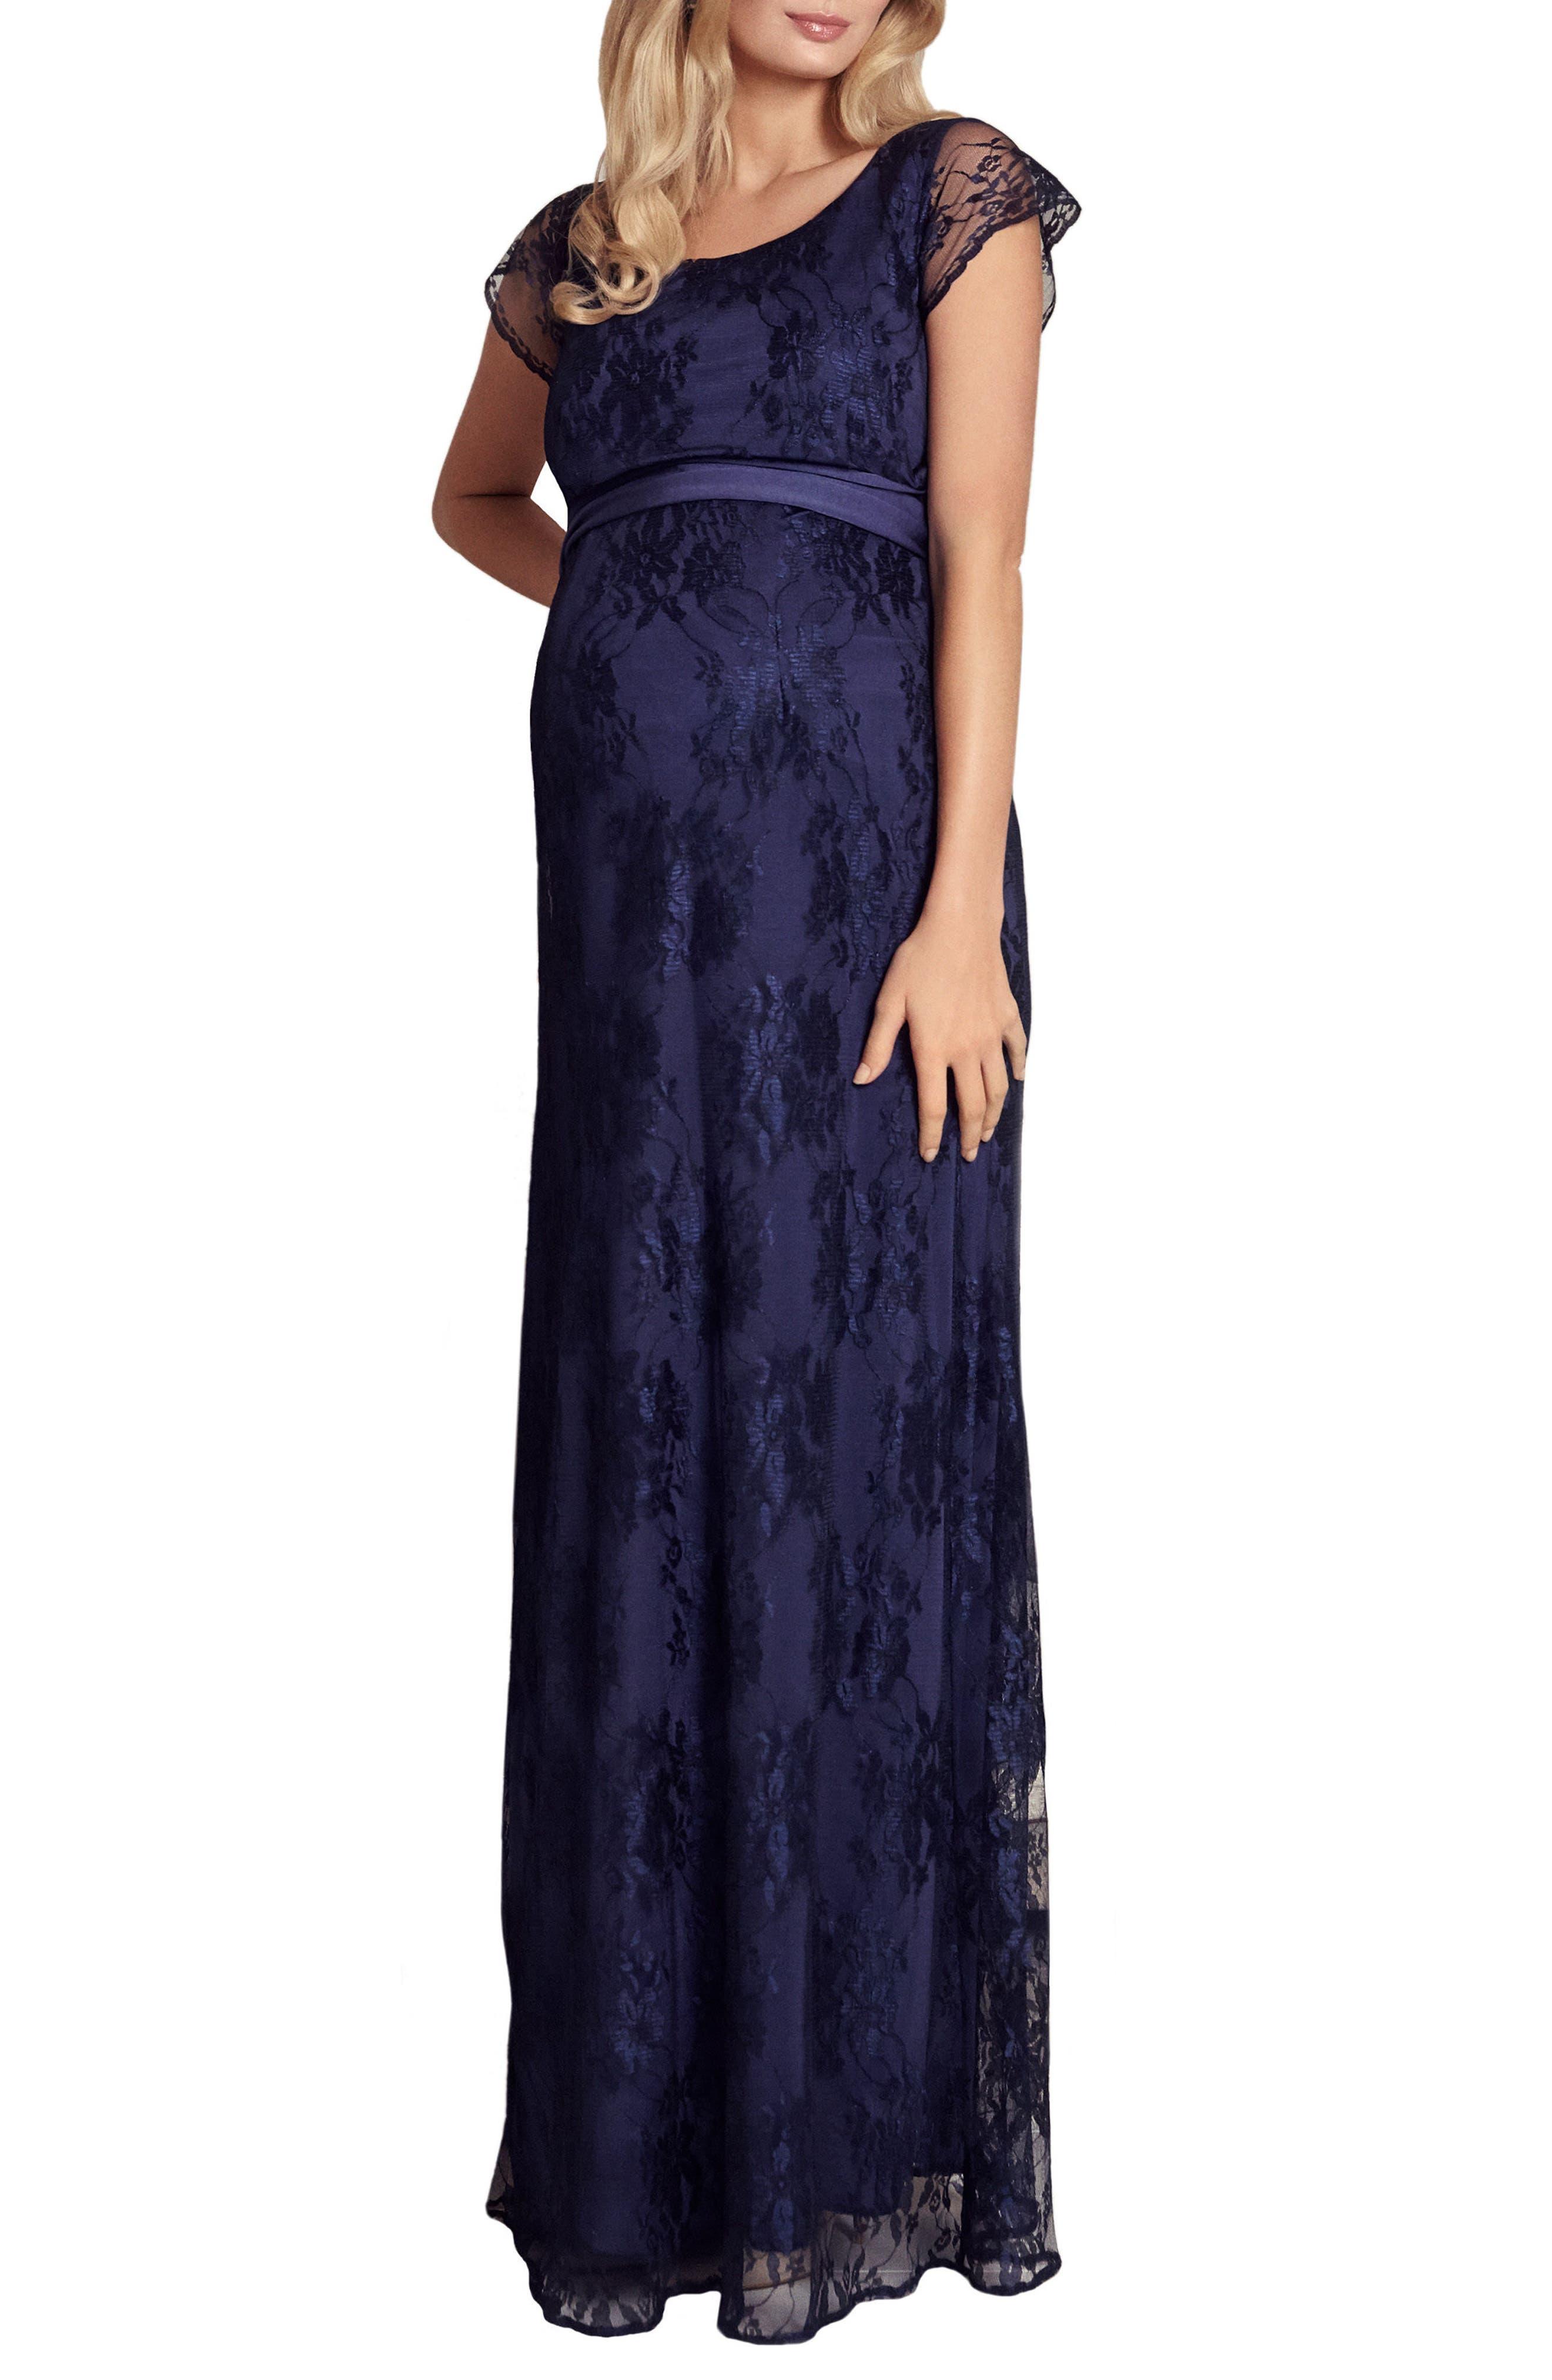 Tiffany Rose April Maternity/nursing Gown, Blue